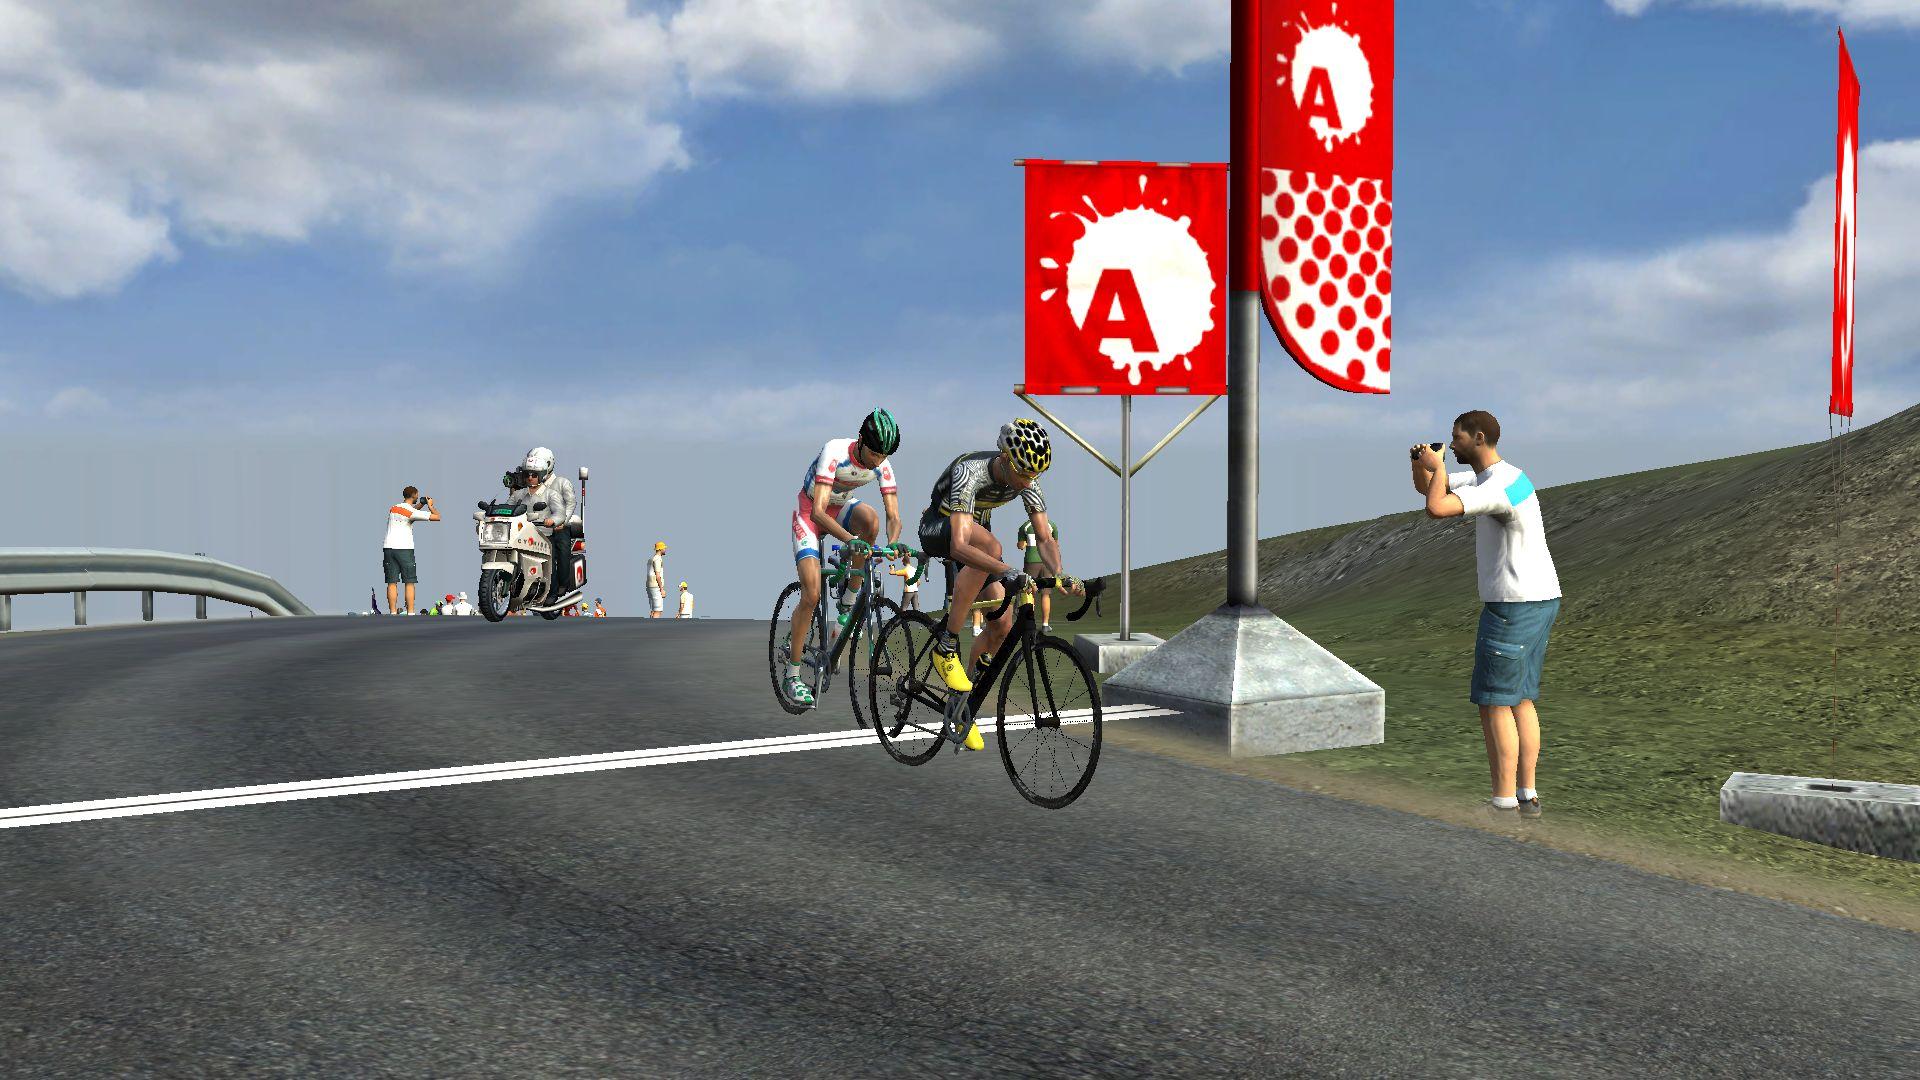 pcmdaily.com/images/mg/2019/Races/GTM/Giro/mg19_giro_12_PCM0097.jpg